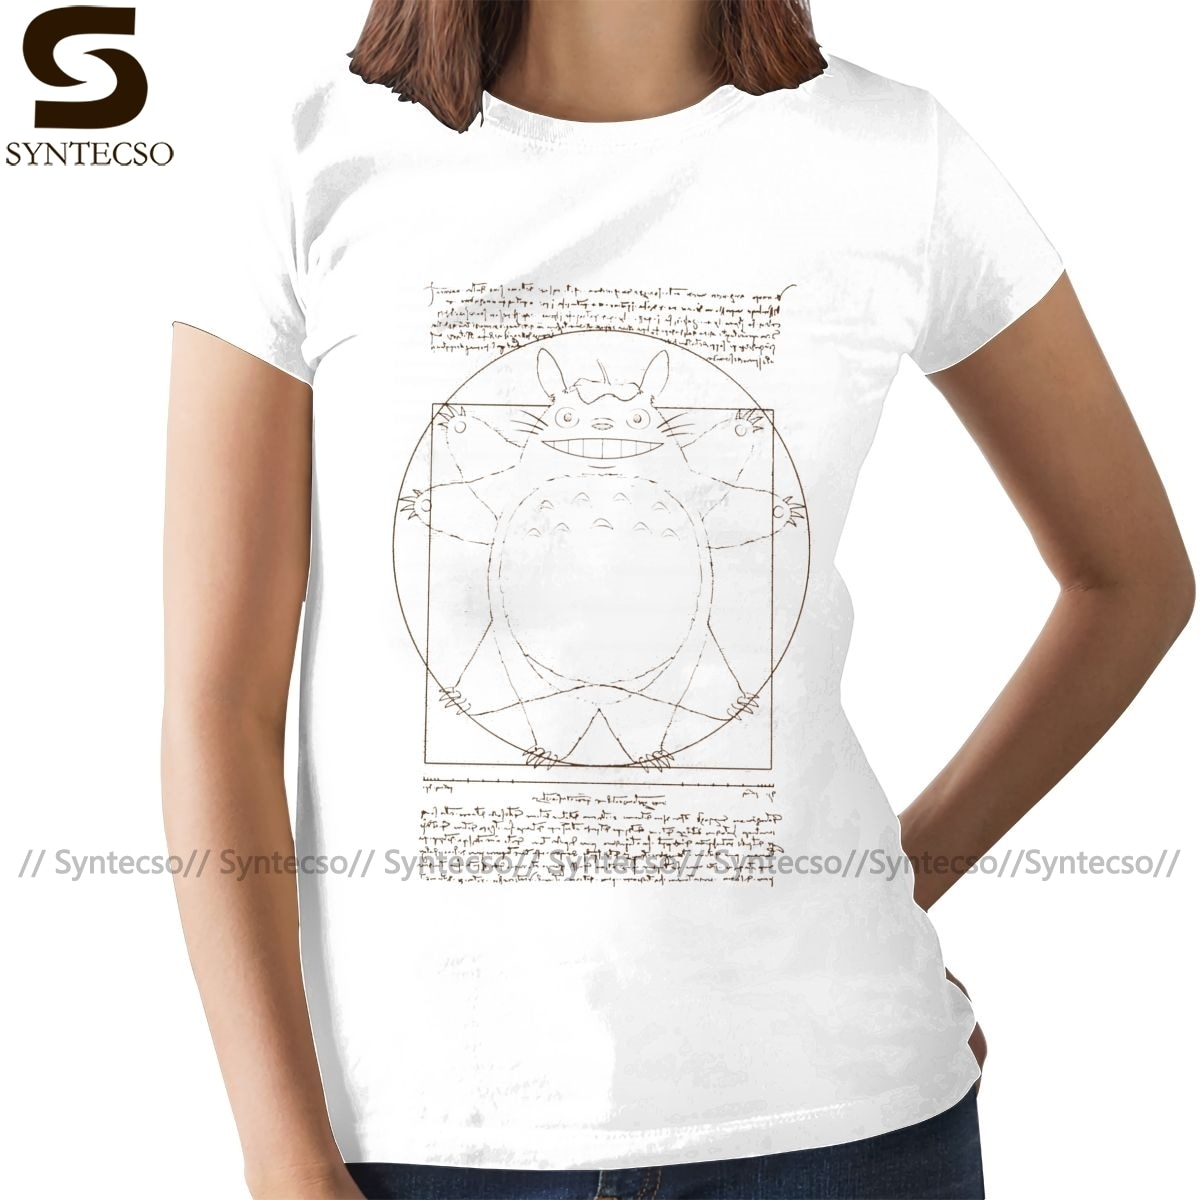 Mi vecino camiseta Totoro Vitruvian Neighbor camiseta nueva moda cuello redondo mujeres camiseta XL señoras camiseta